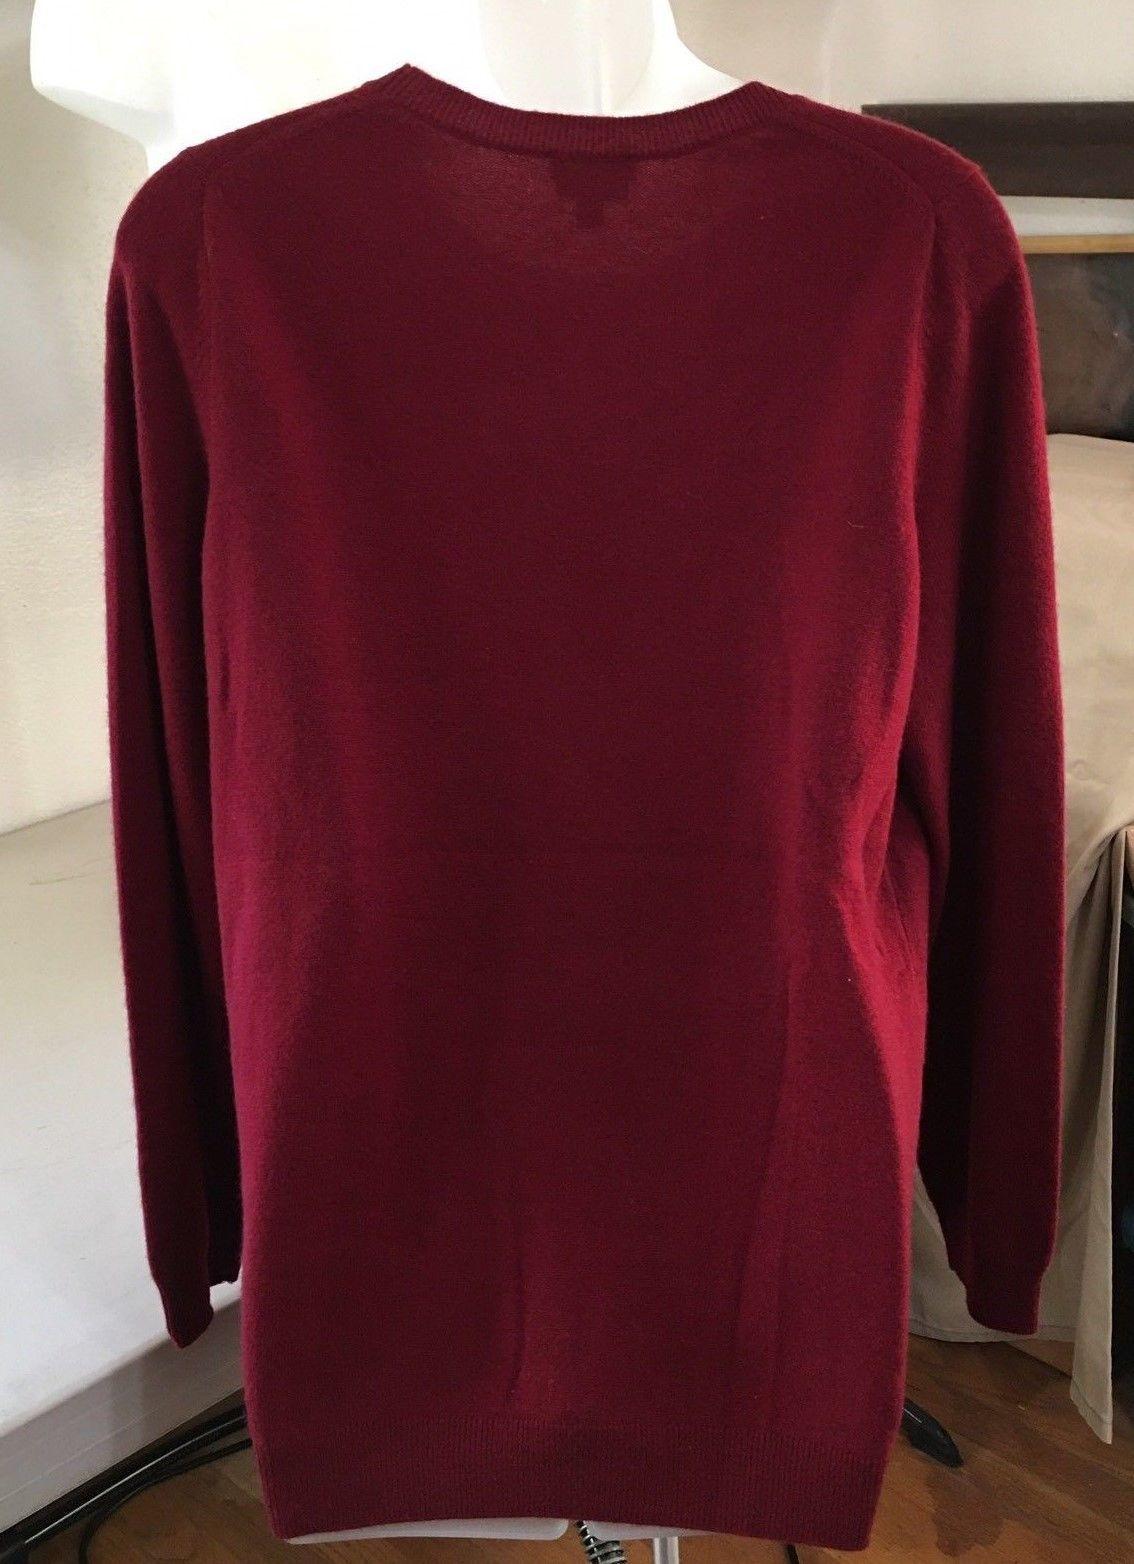 Talbots Pure Cashmere Women's X Crew Neck Sweater Deep Burgundy Wine C103 image 3